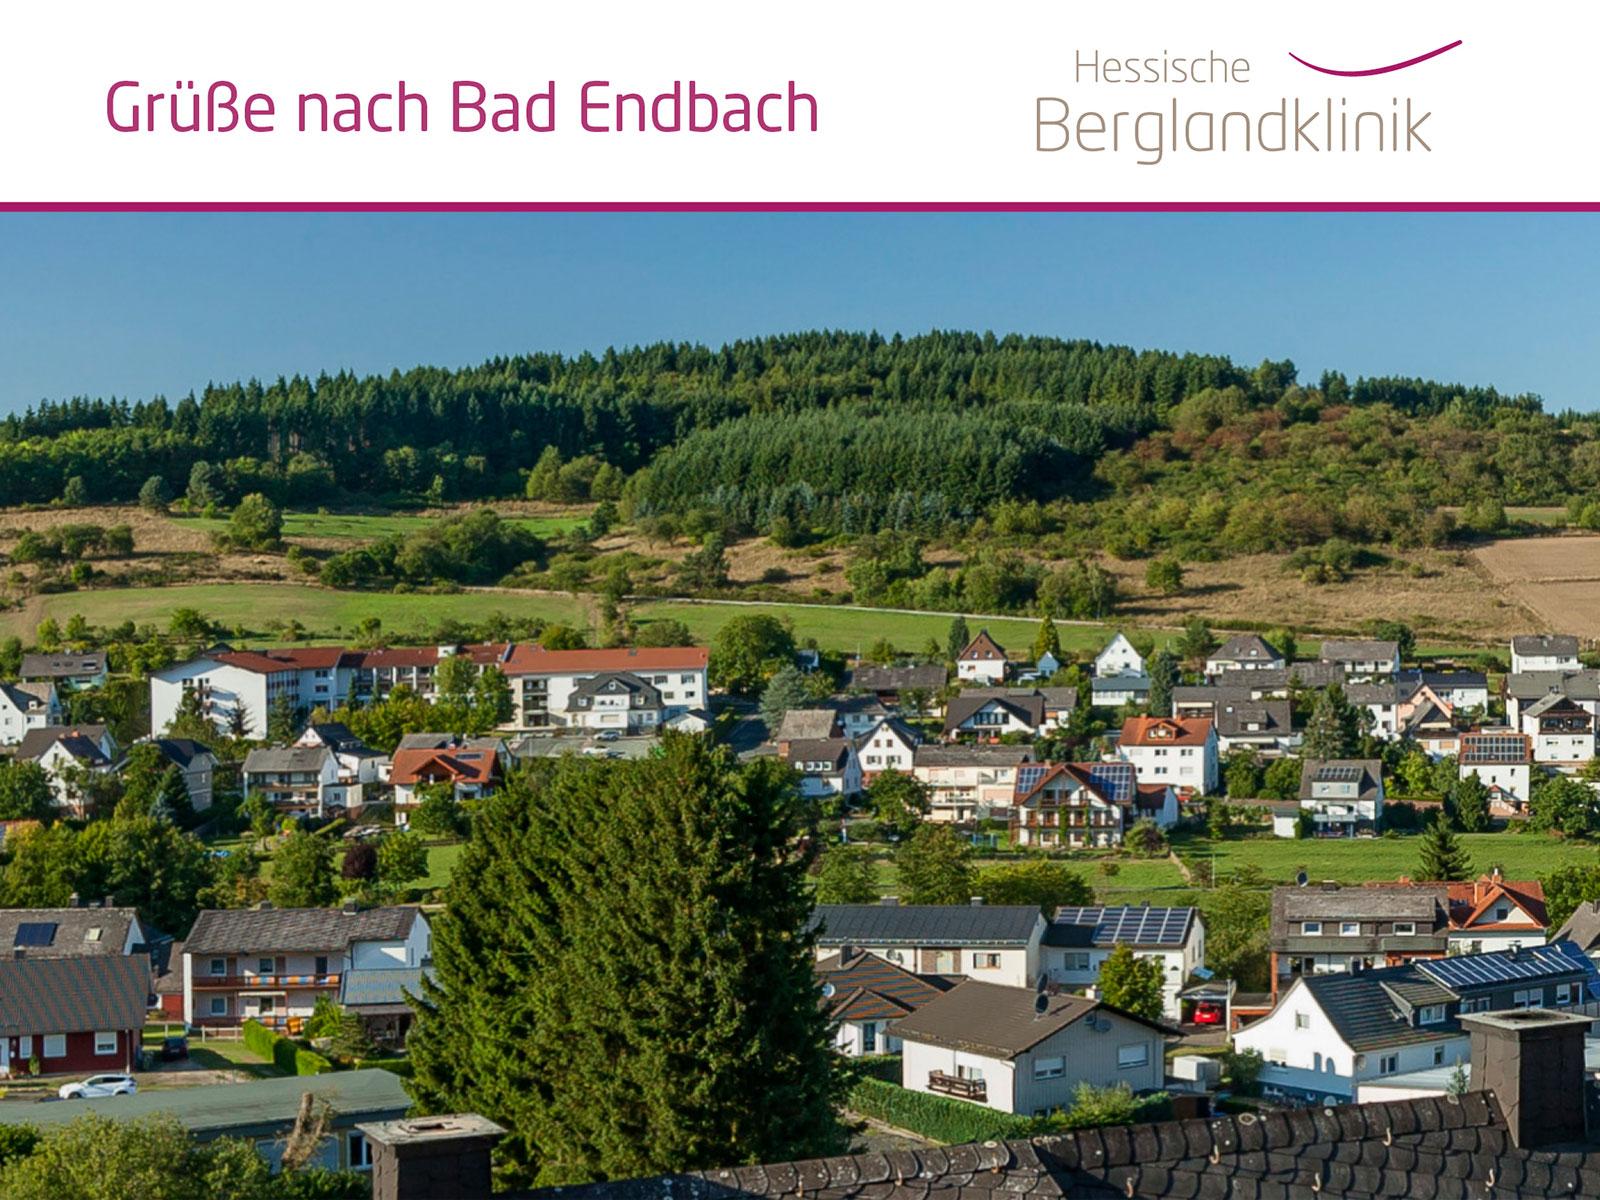 gruesse_nach_bad_endbach.jpg